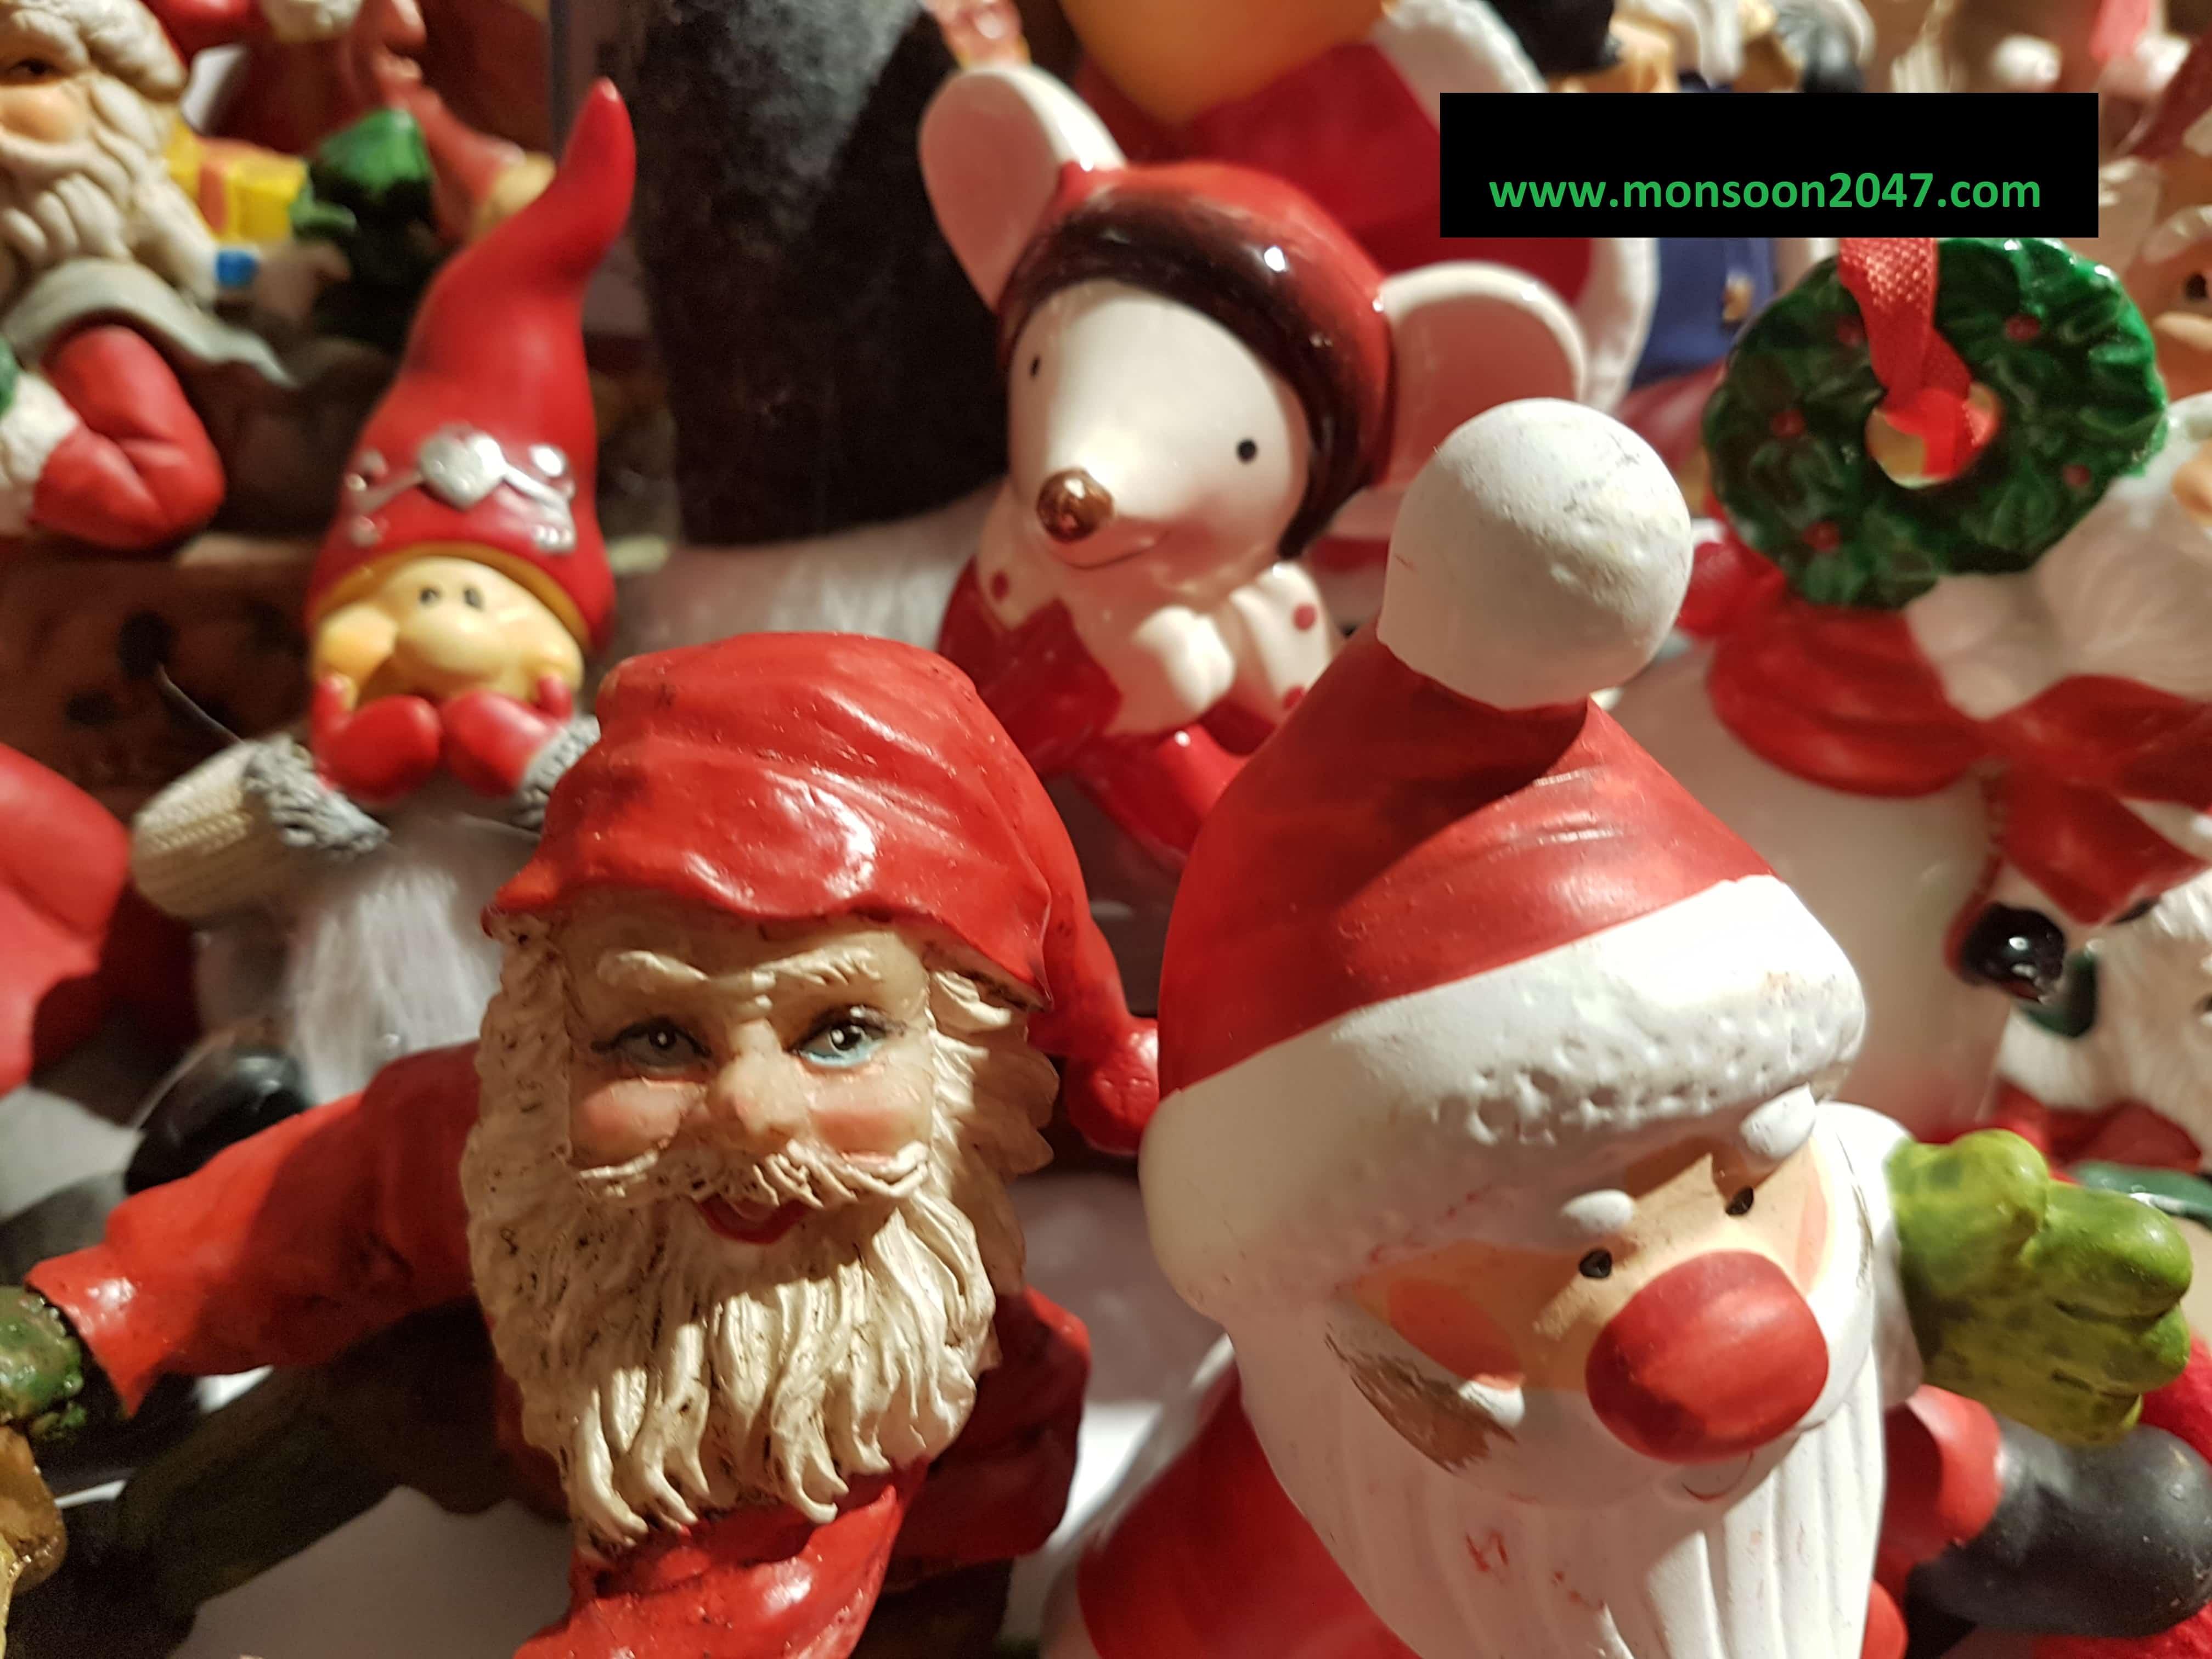 Santa Claus: Sharing Joys, Giving Gifts, Ushering Christmas Spirit